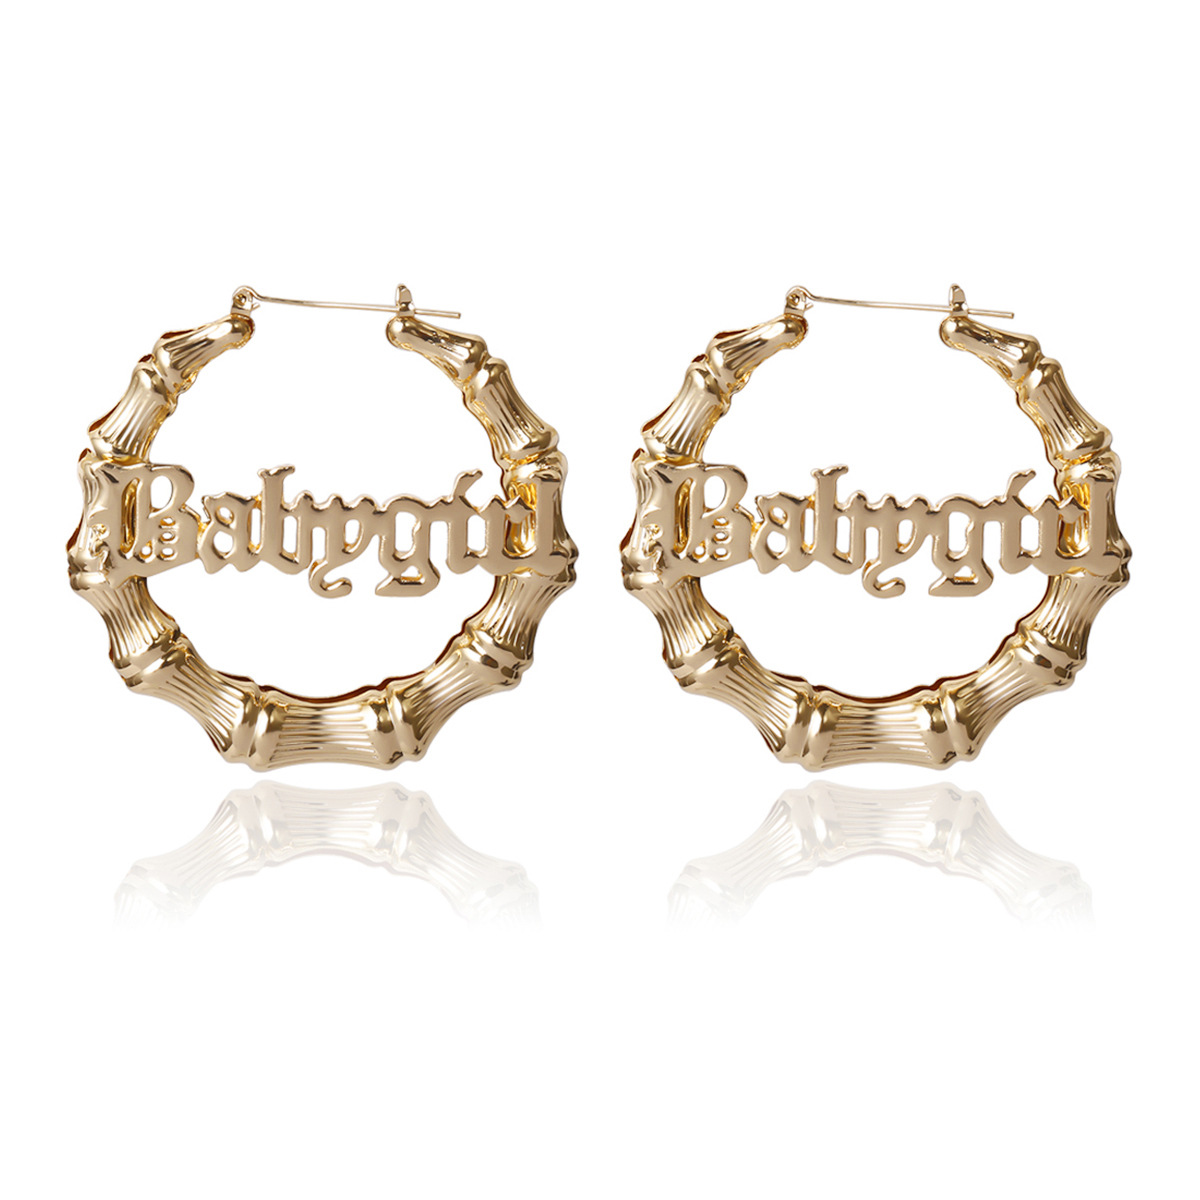 America Exaggerated Letter BABY GIRL Earrings Oversize Gold Hoop Custom Bamboo Earrings Hoops For Girls Jewelry, Golden